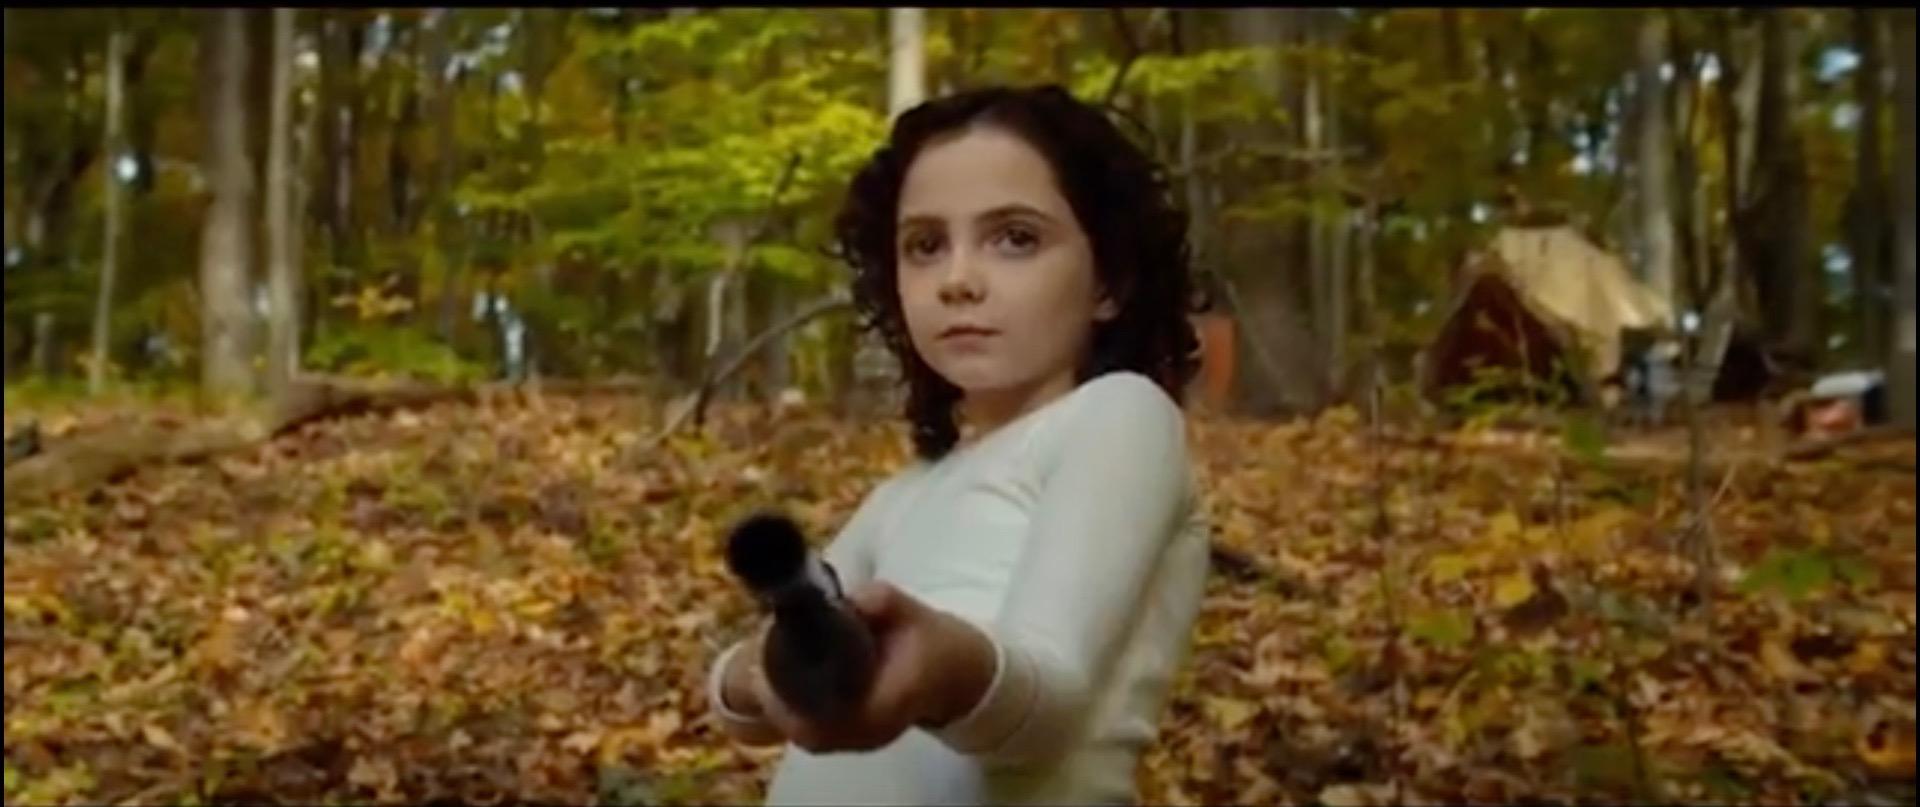 Casey Threatening To Shoot John